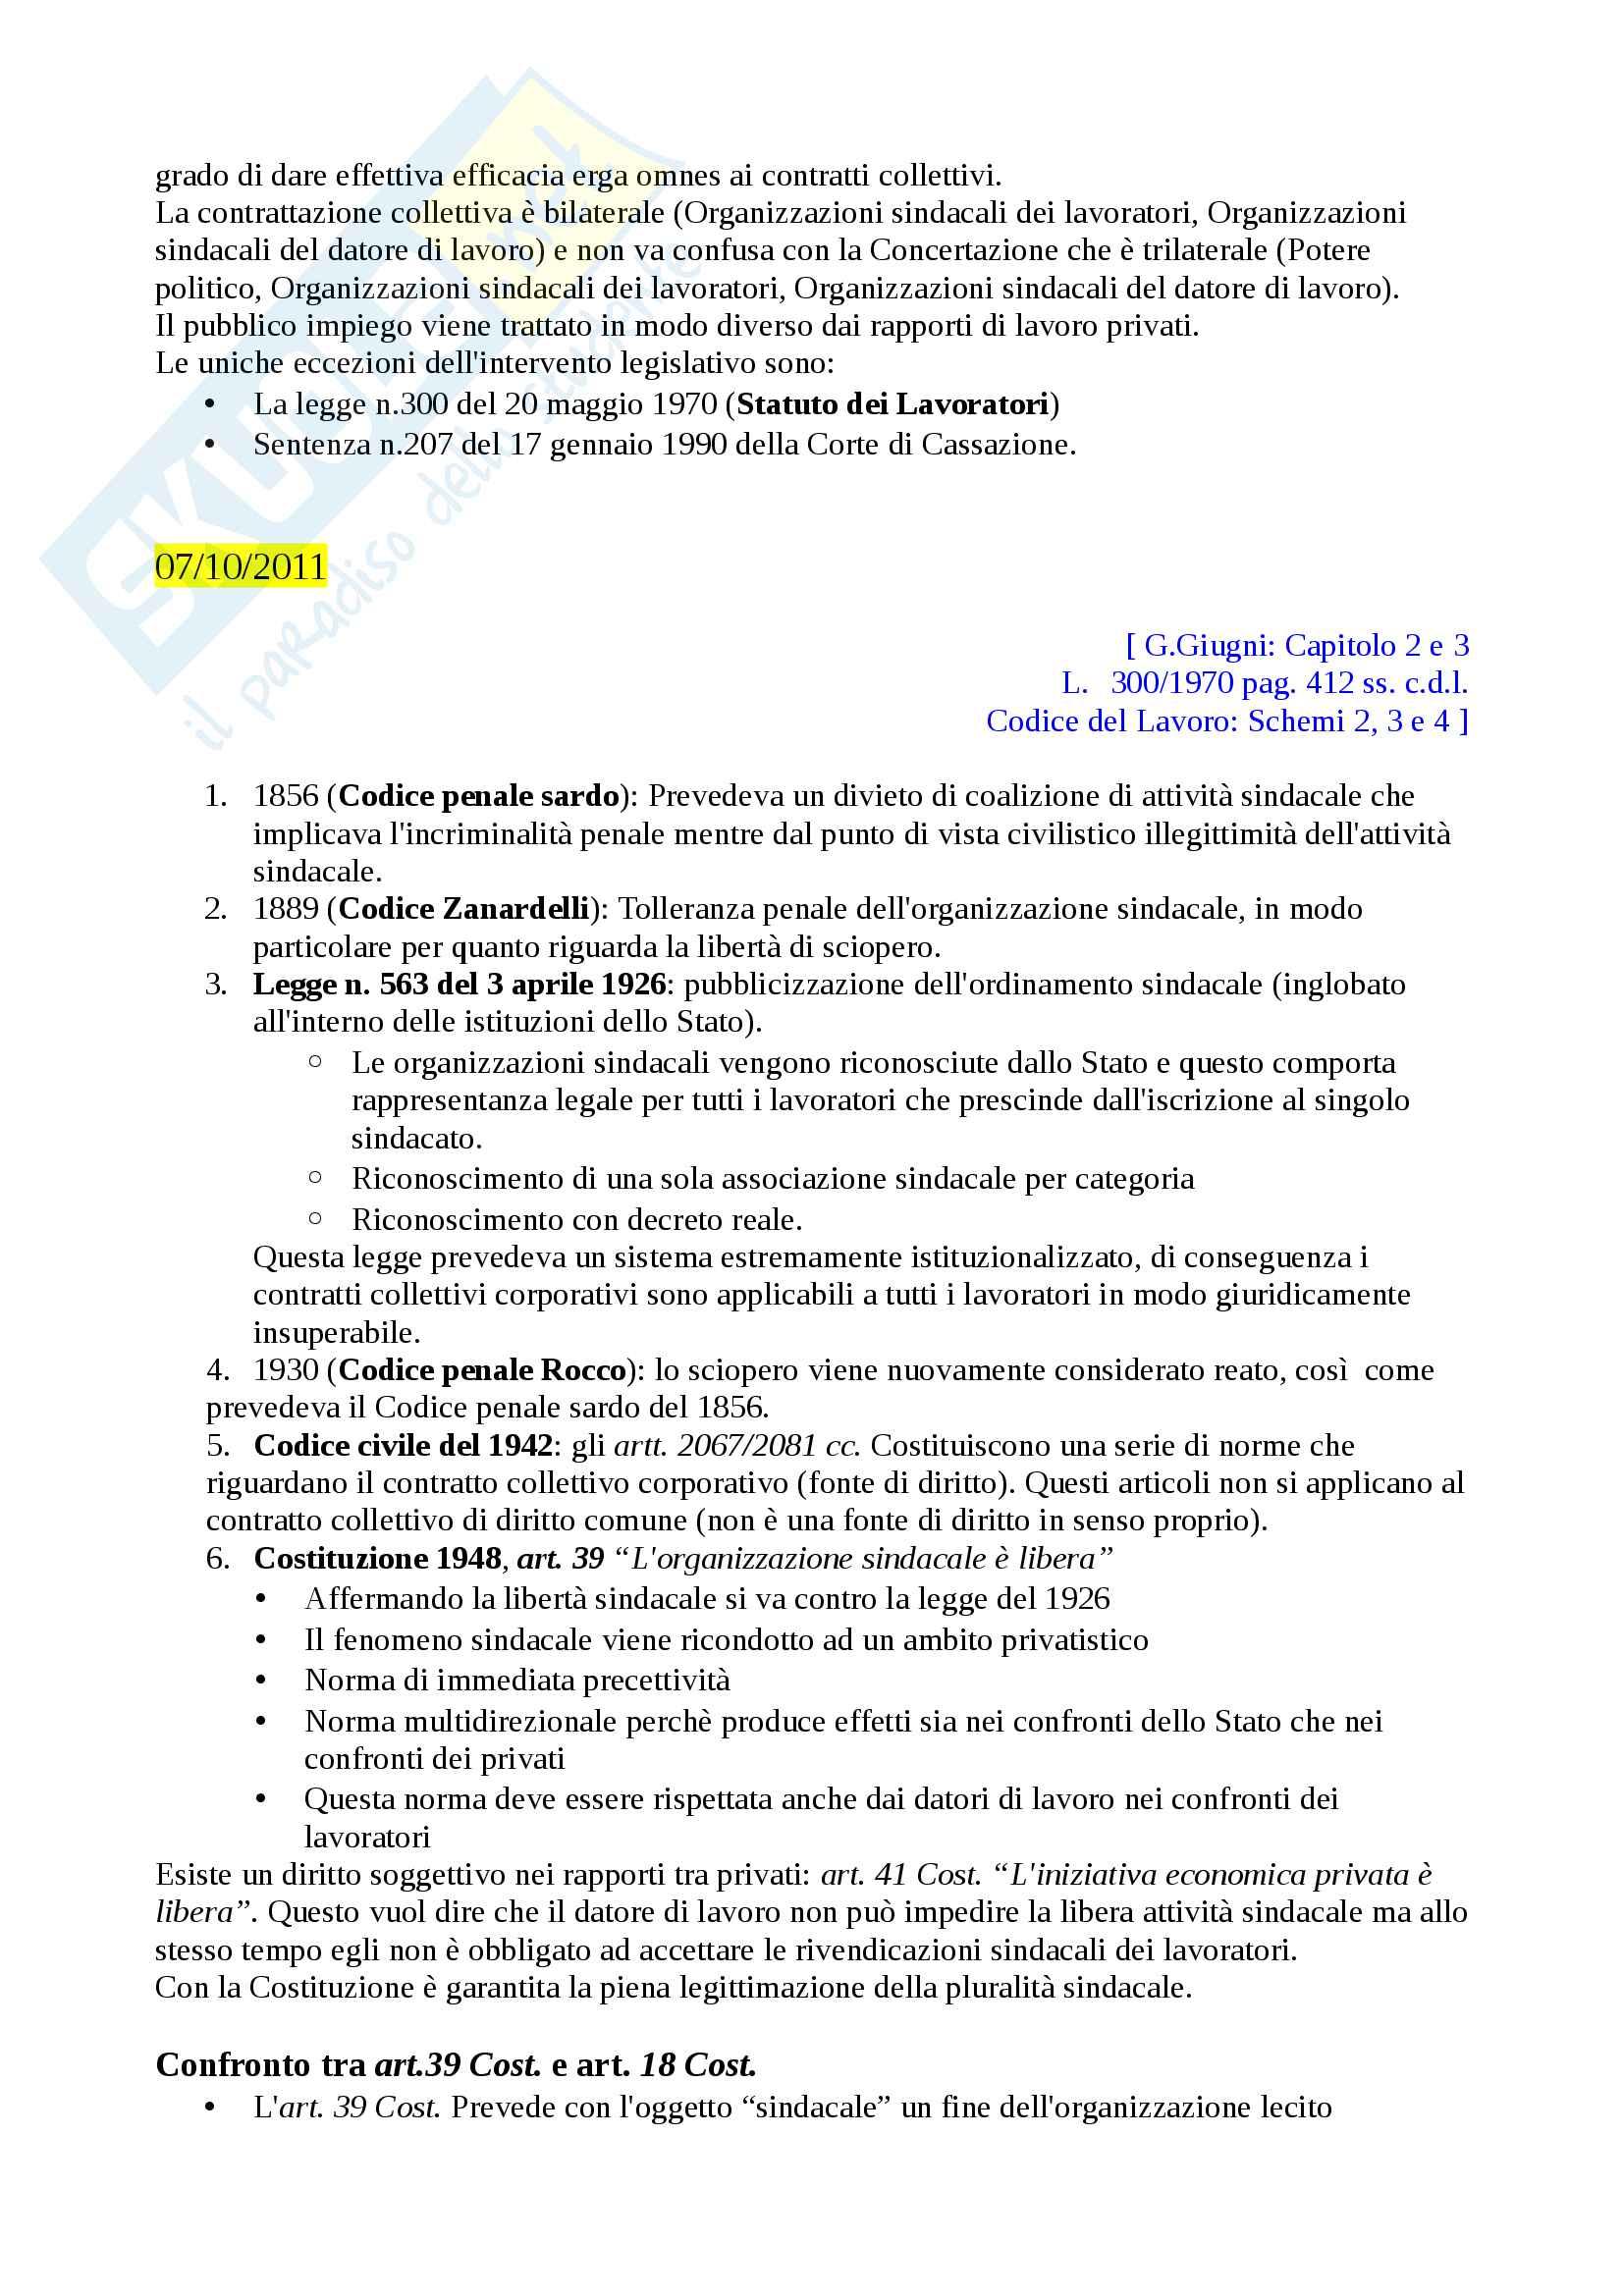 Appunti Diritto Sindacale 2011 Lucio Imberti Pag. 2